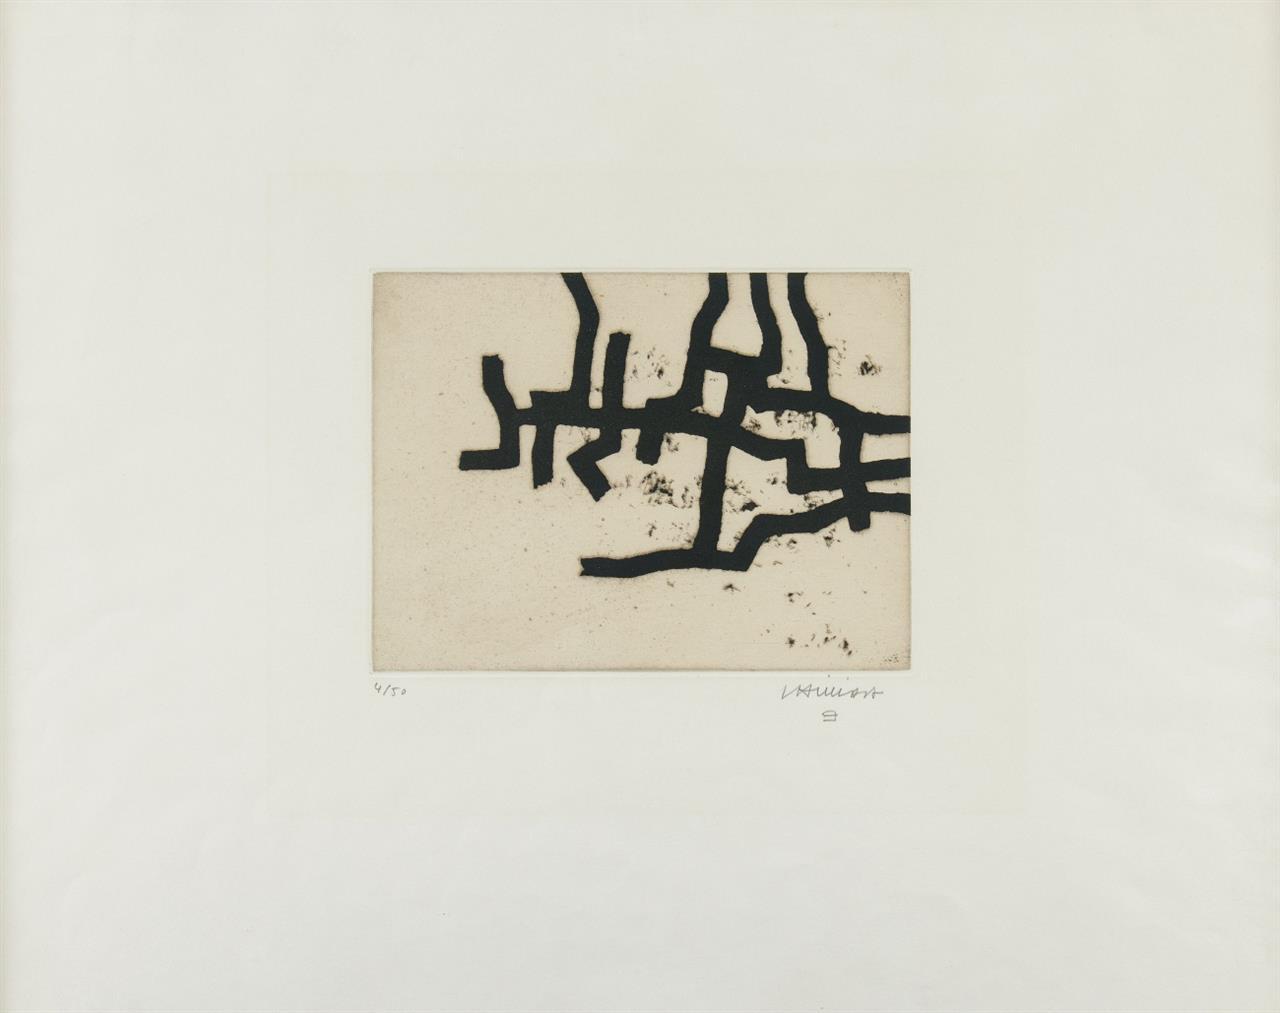 Eduardo Chillida. Continuation III. 1966. Radierung. Signiert. Ex. 4/50. v. d. K. 66005.